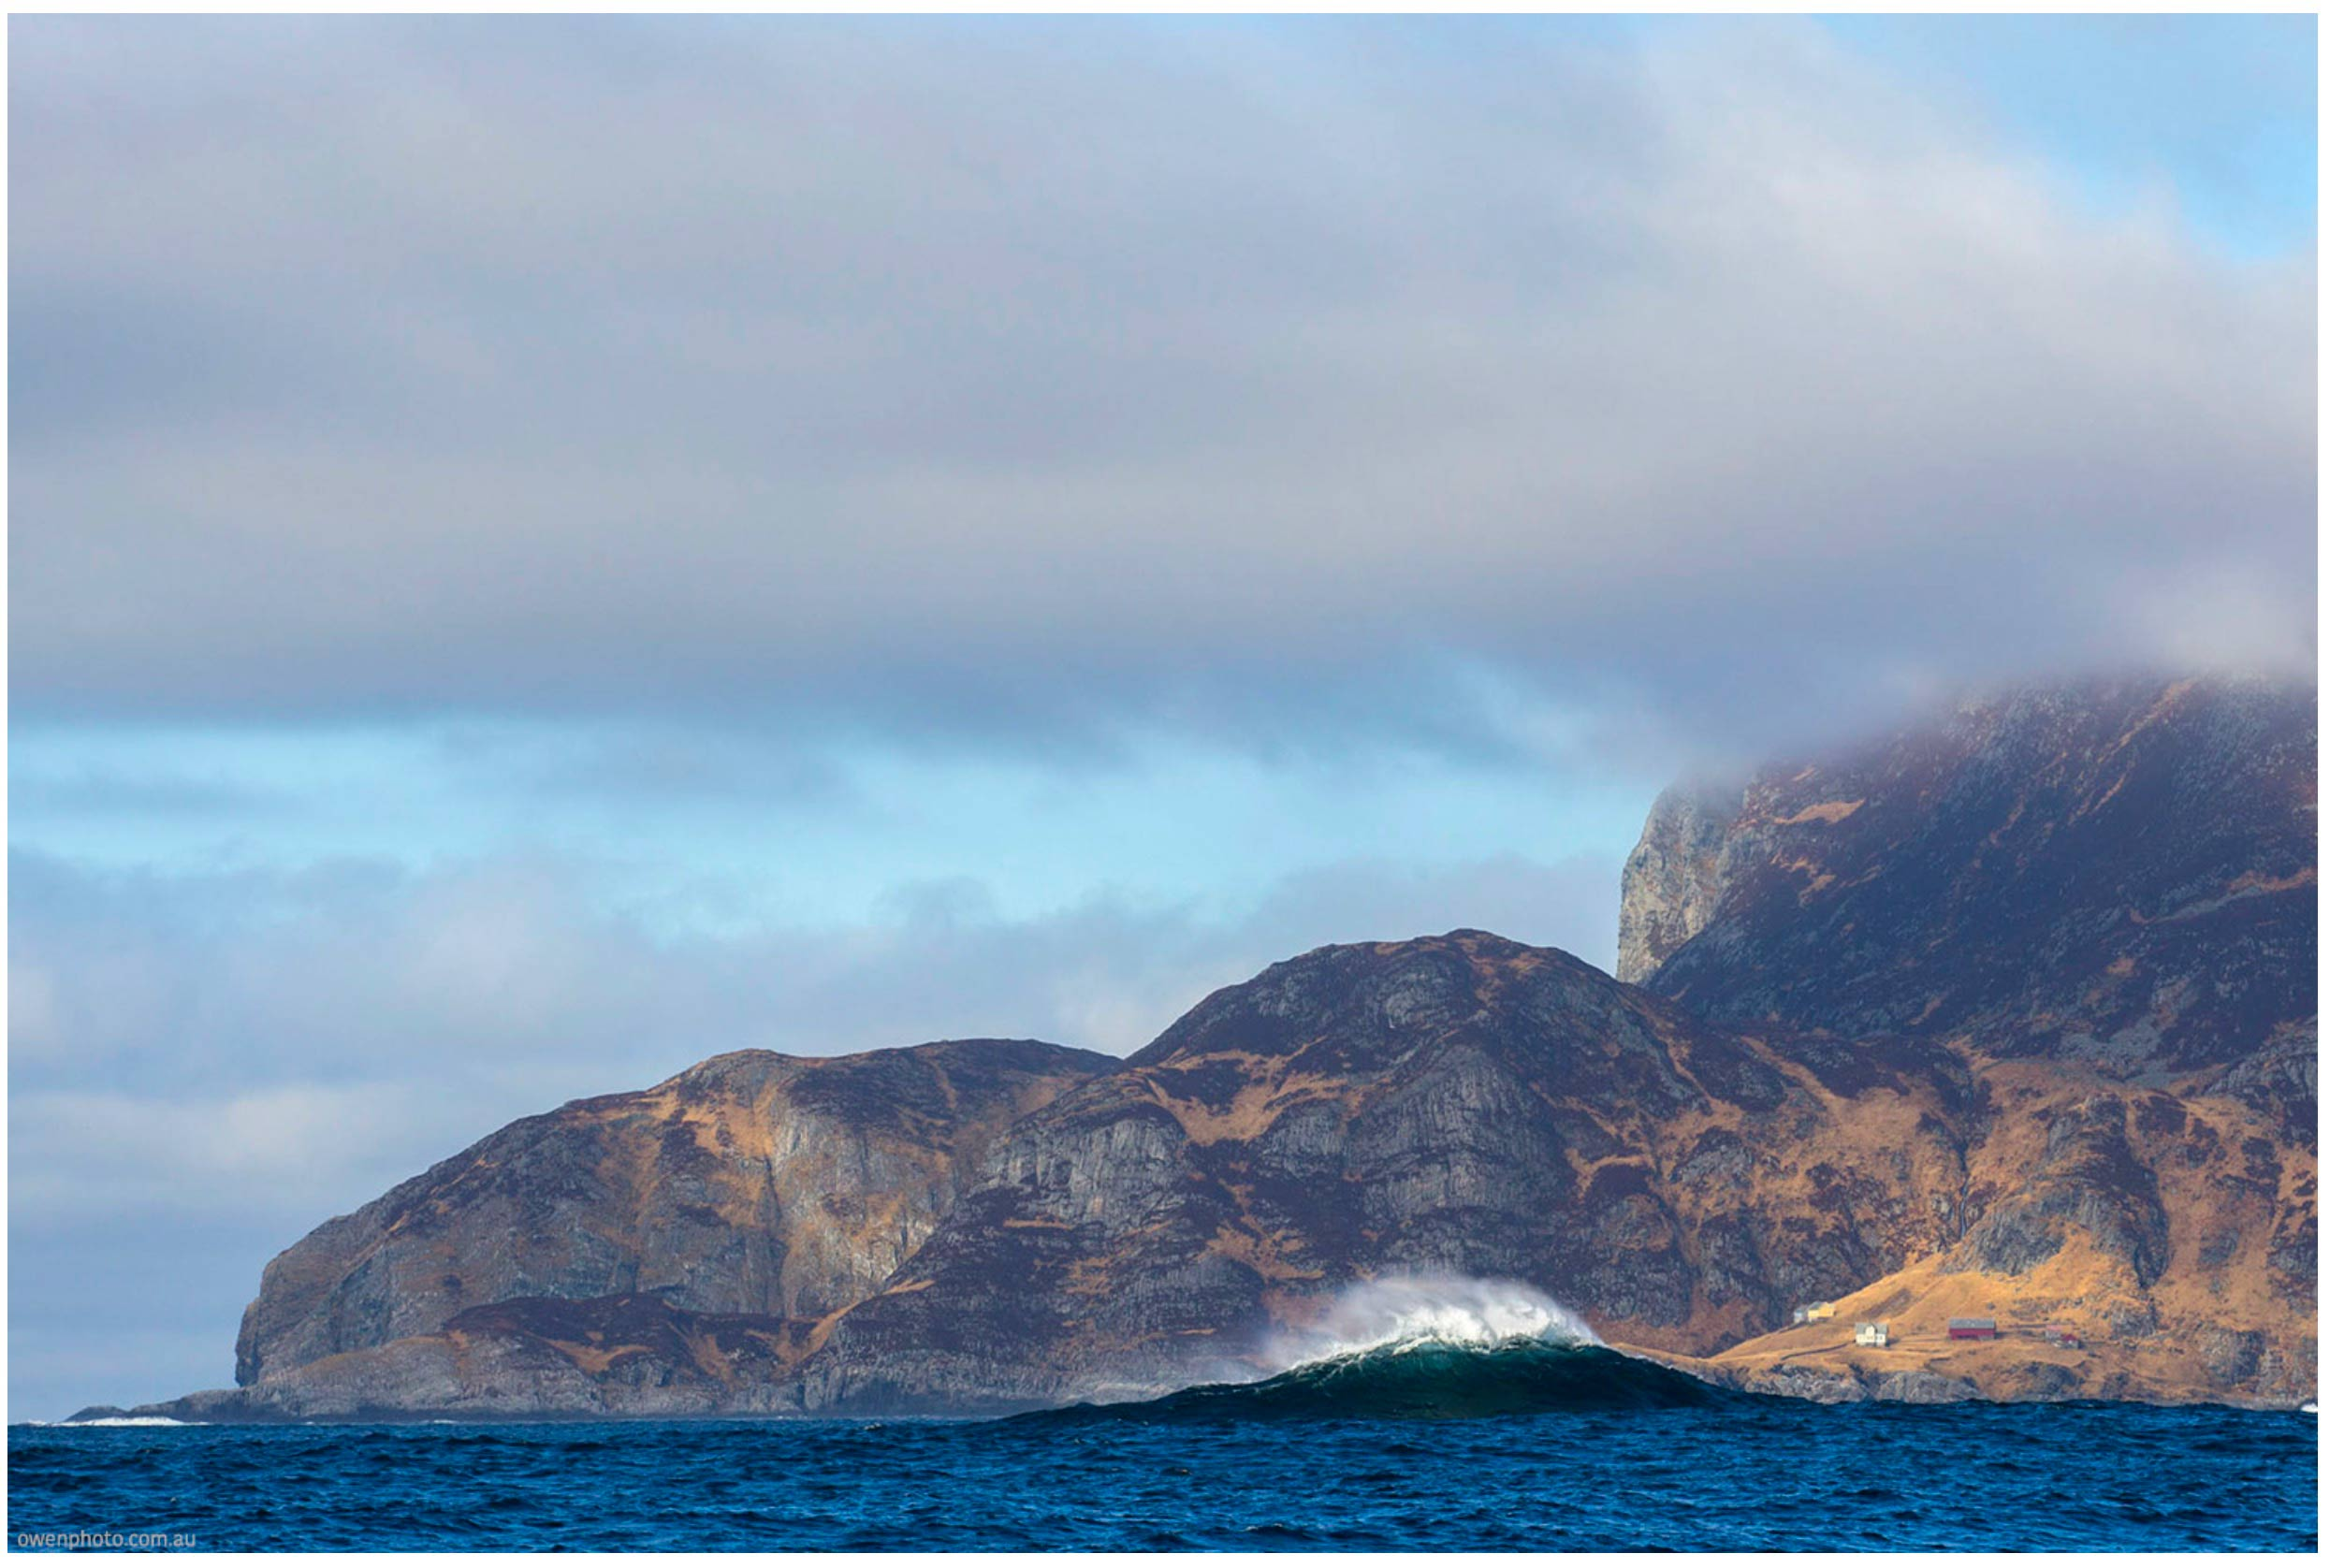 rodd-owen-ocean-surf-photography-for-sale-131.jpg